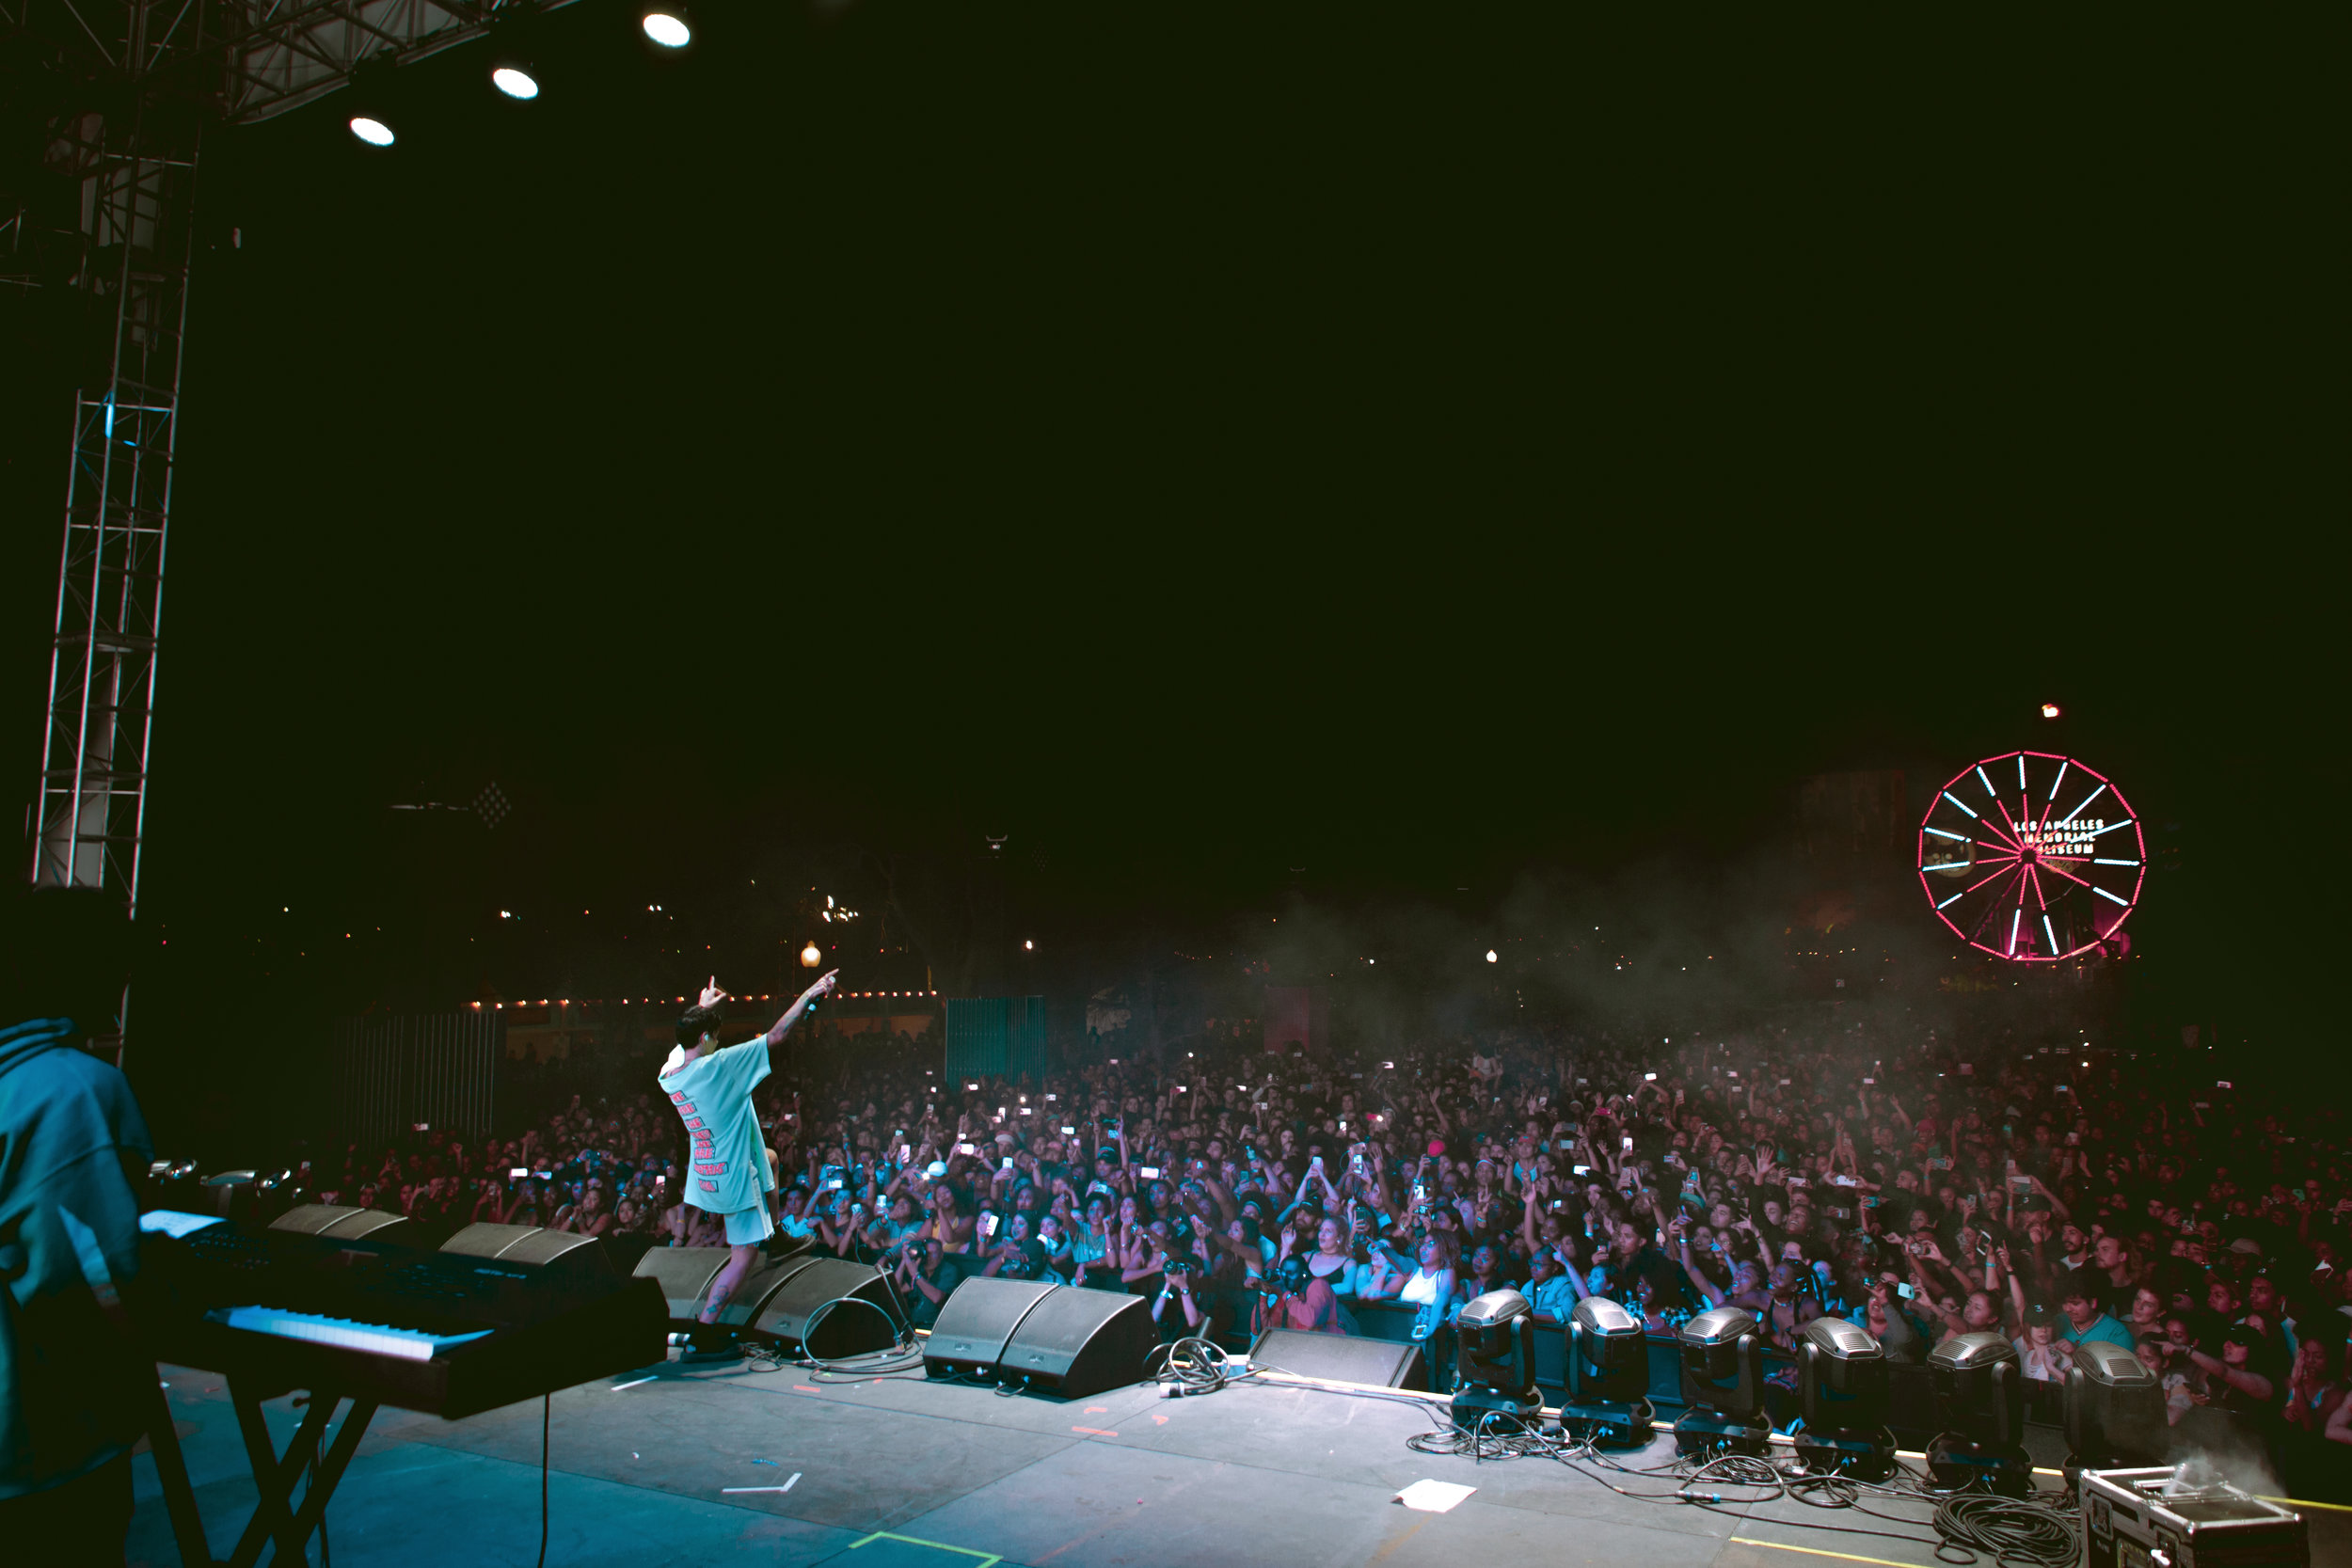 flog gnaw kehlani crowd1.jpg